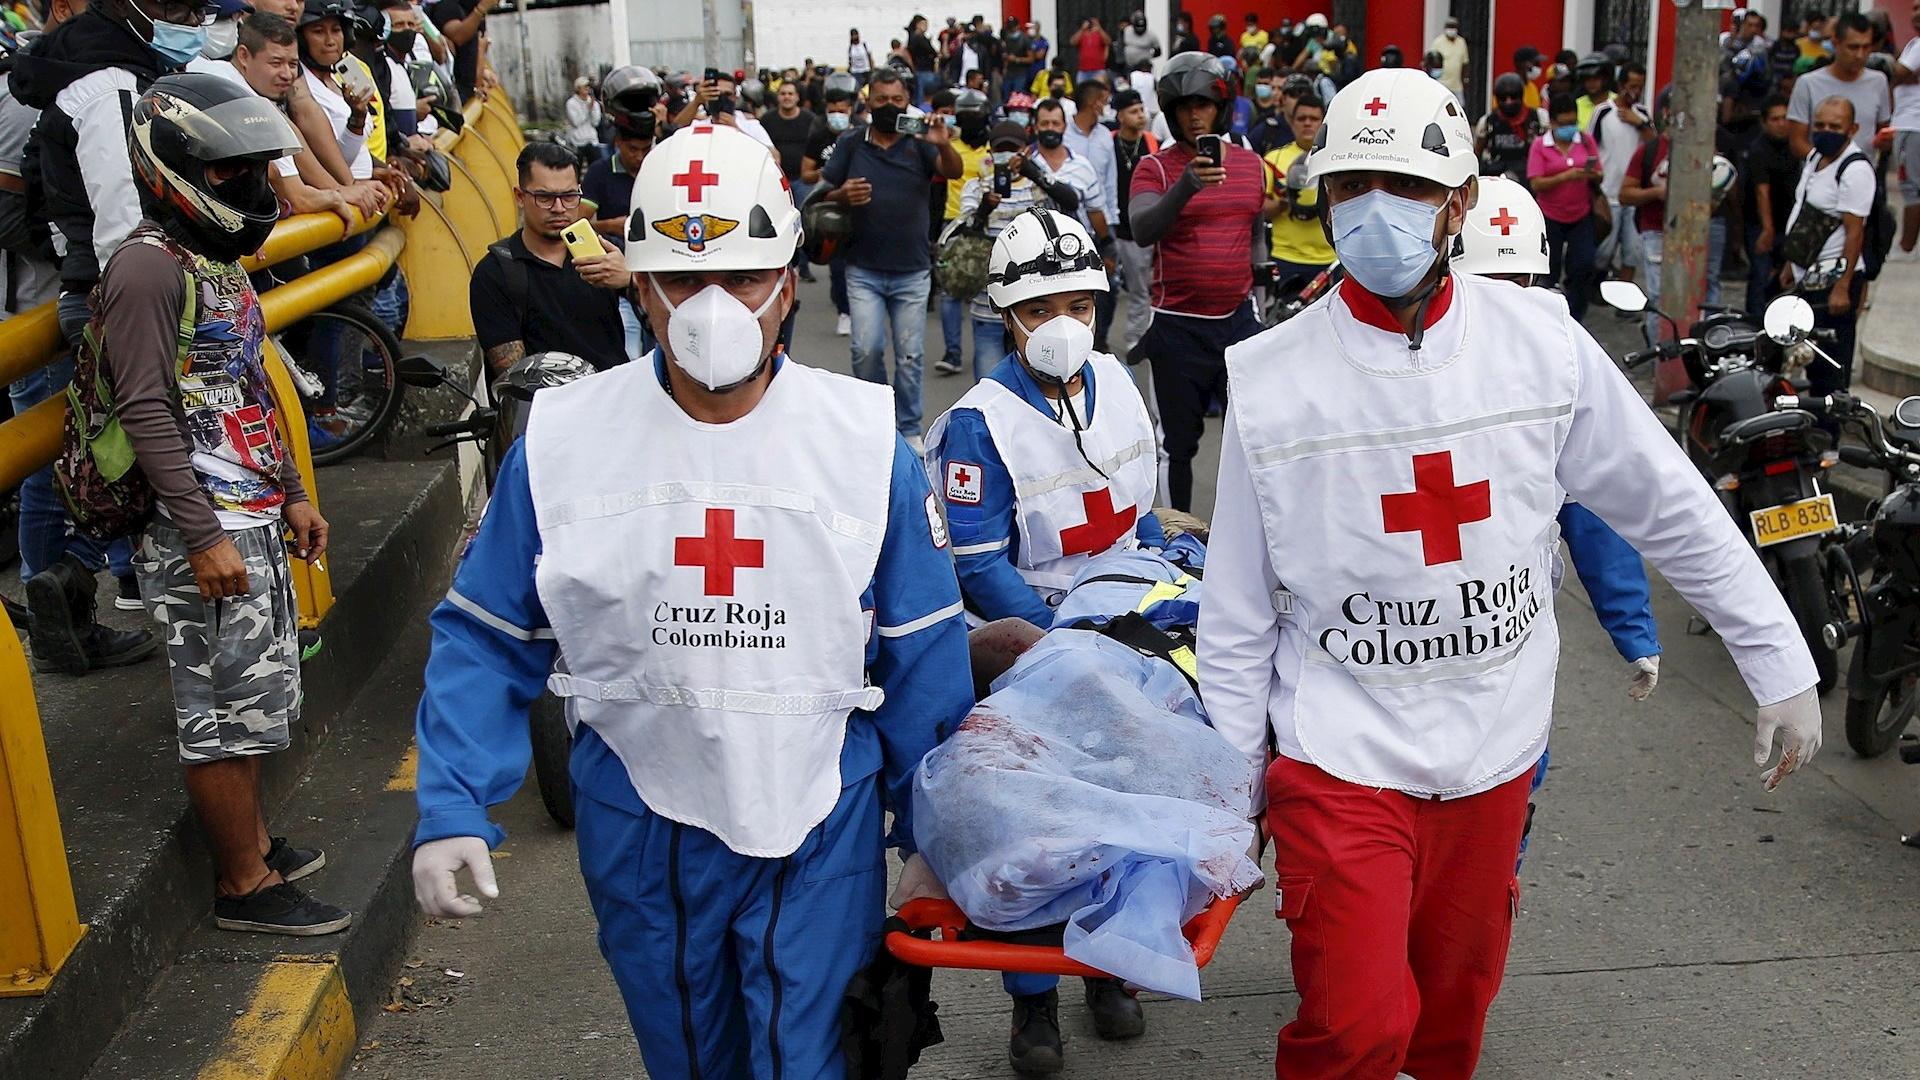 Cali colombia muerto protesta disparos ataque 2